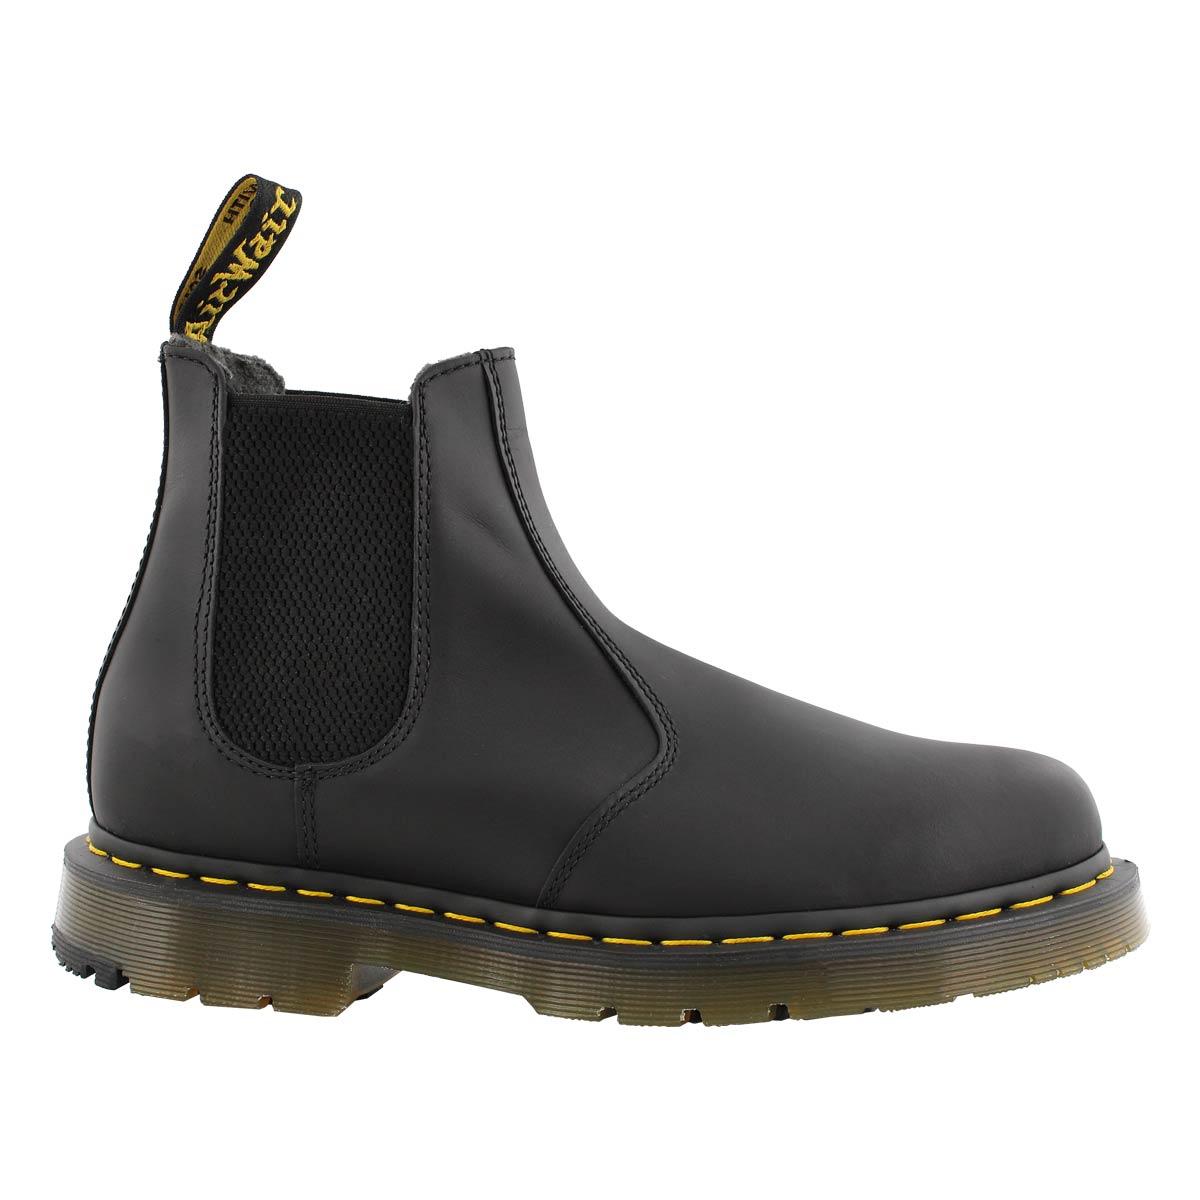 Mns 2976 Snowplow blk wtpf chelsea boot